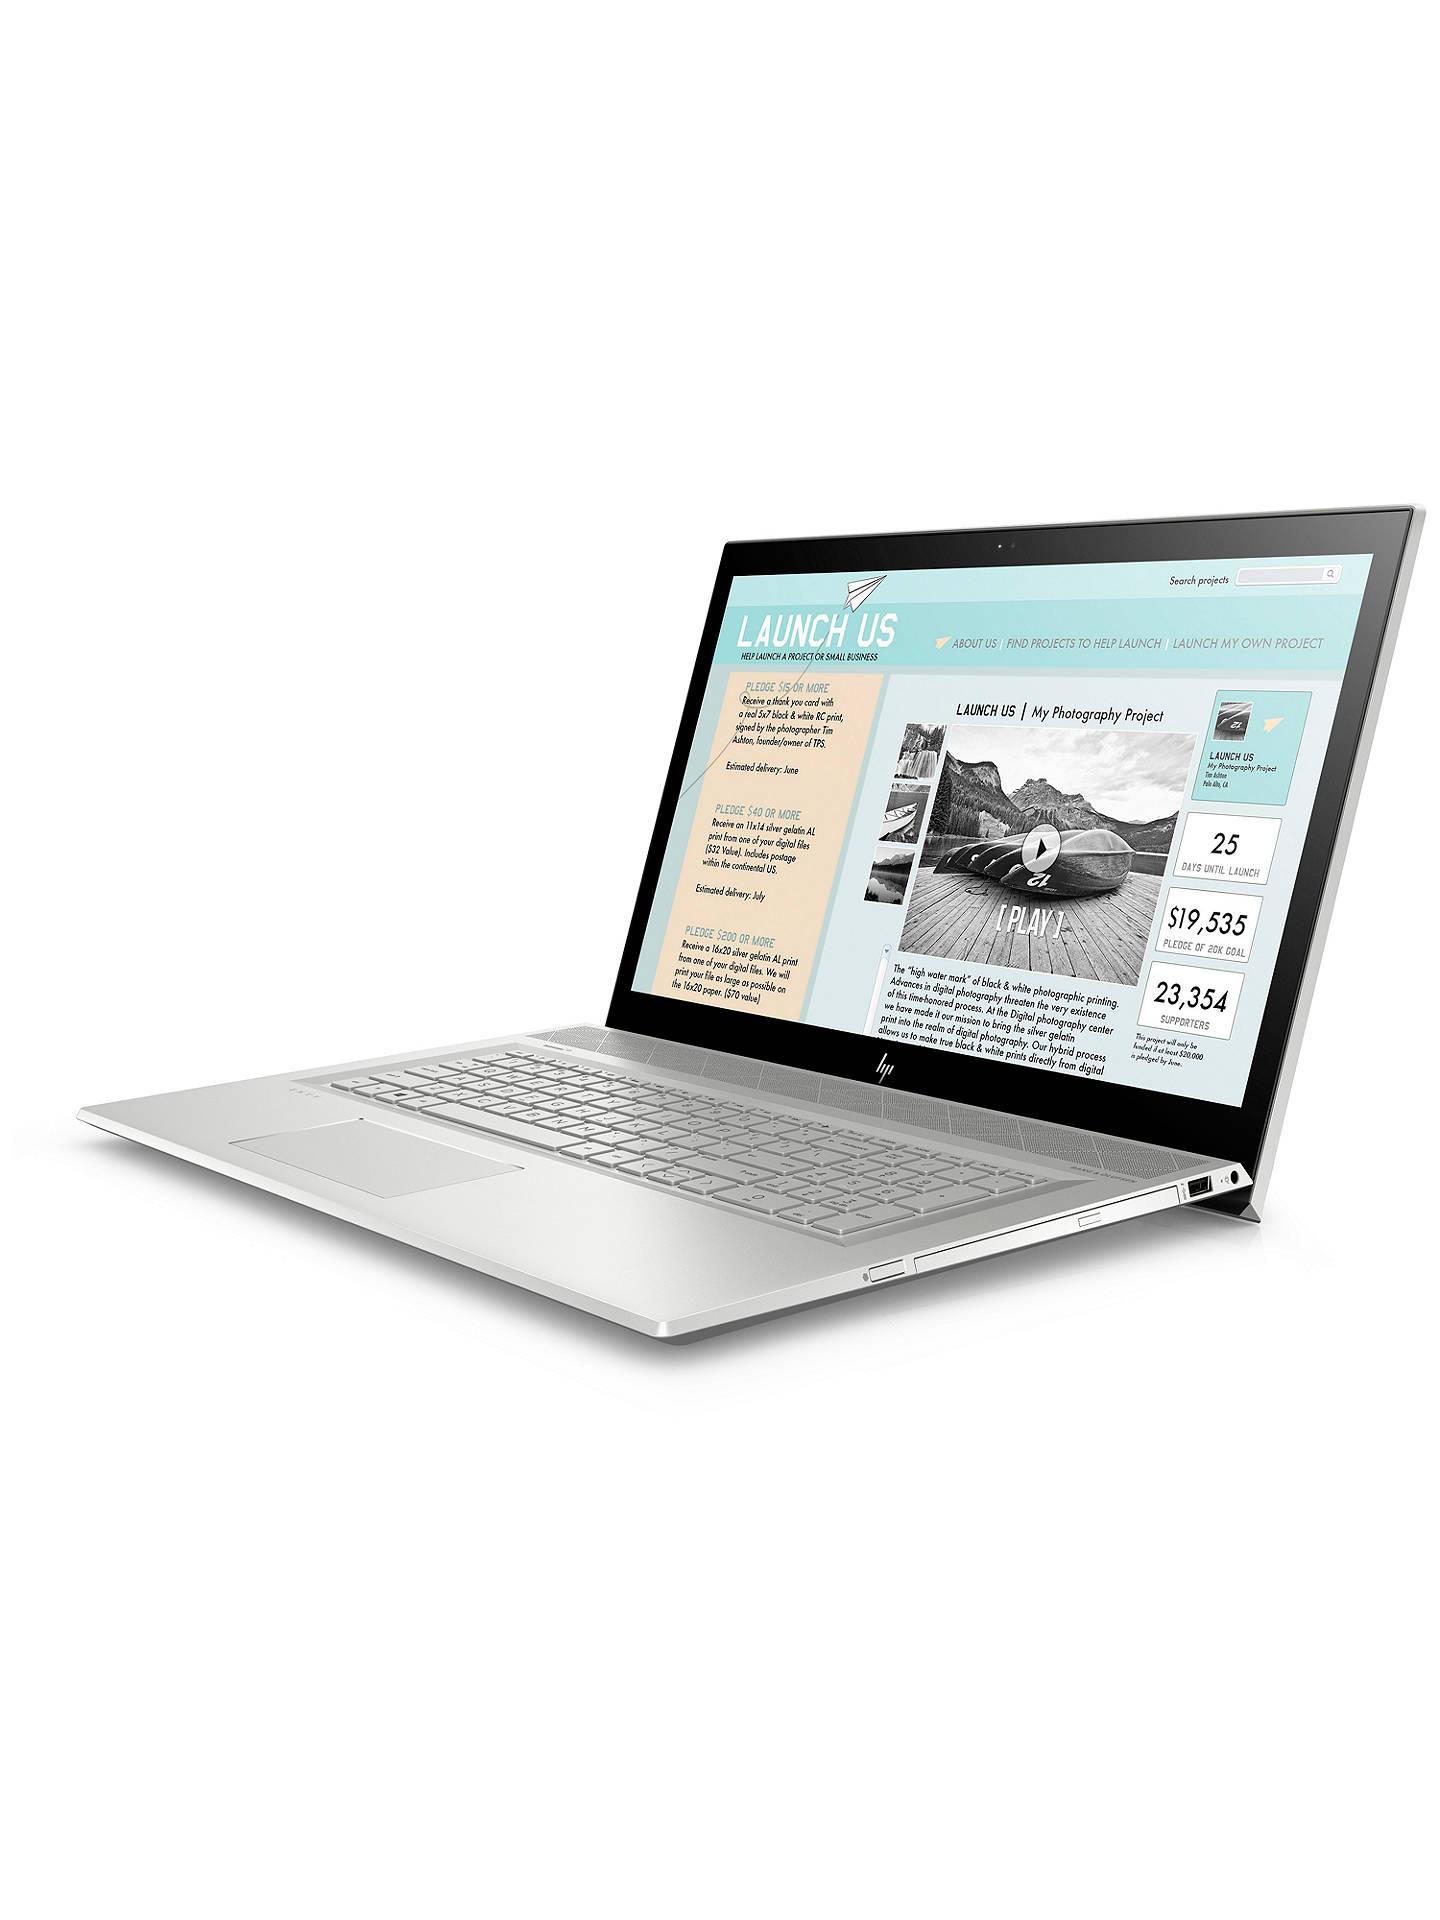 HP ENVY 17-bw0999na Laptop, Intel Core i7, 8GB RAM, 1TB HDD + 16GB Intel  Optane Memory, 17 3